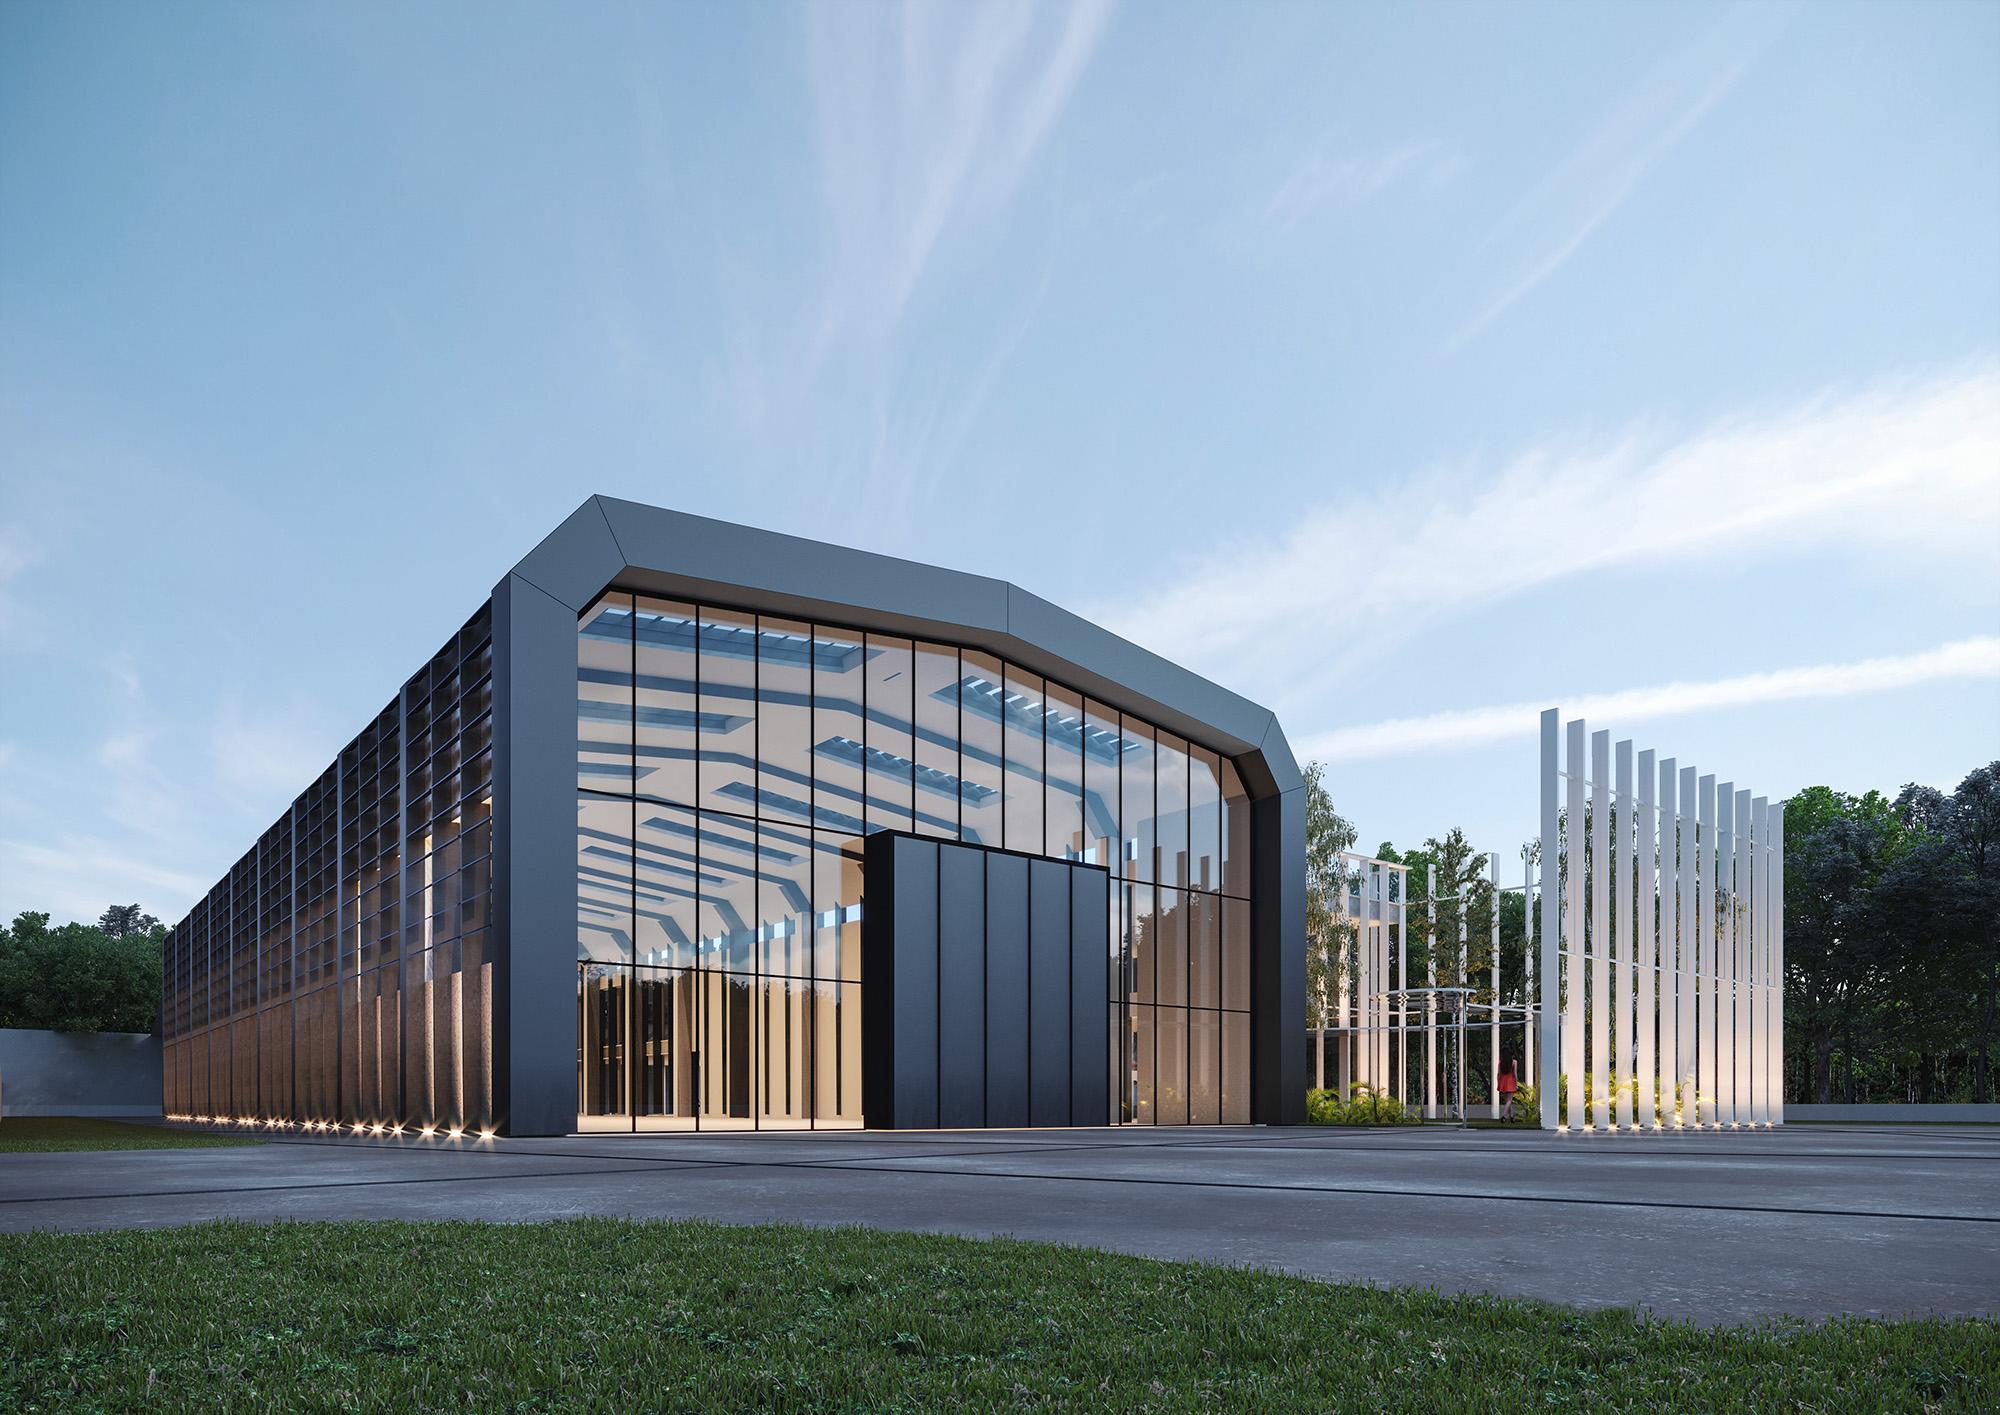 umberto_mauri_architetto_mauri_studio_lecco_headquarter_office_renovation_new_building_sketch_render_angolo_2000